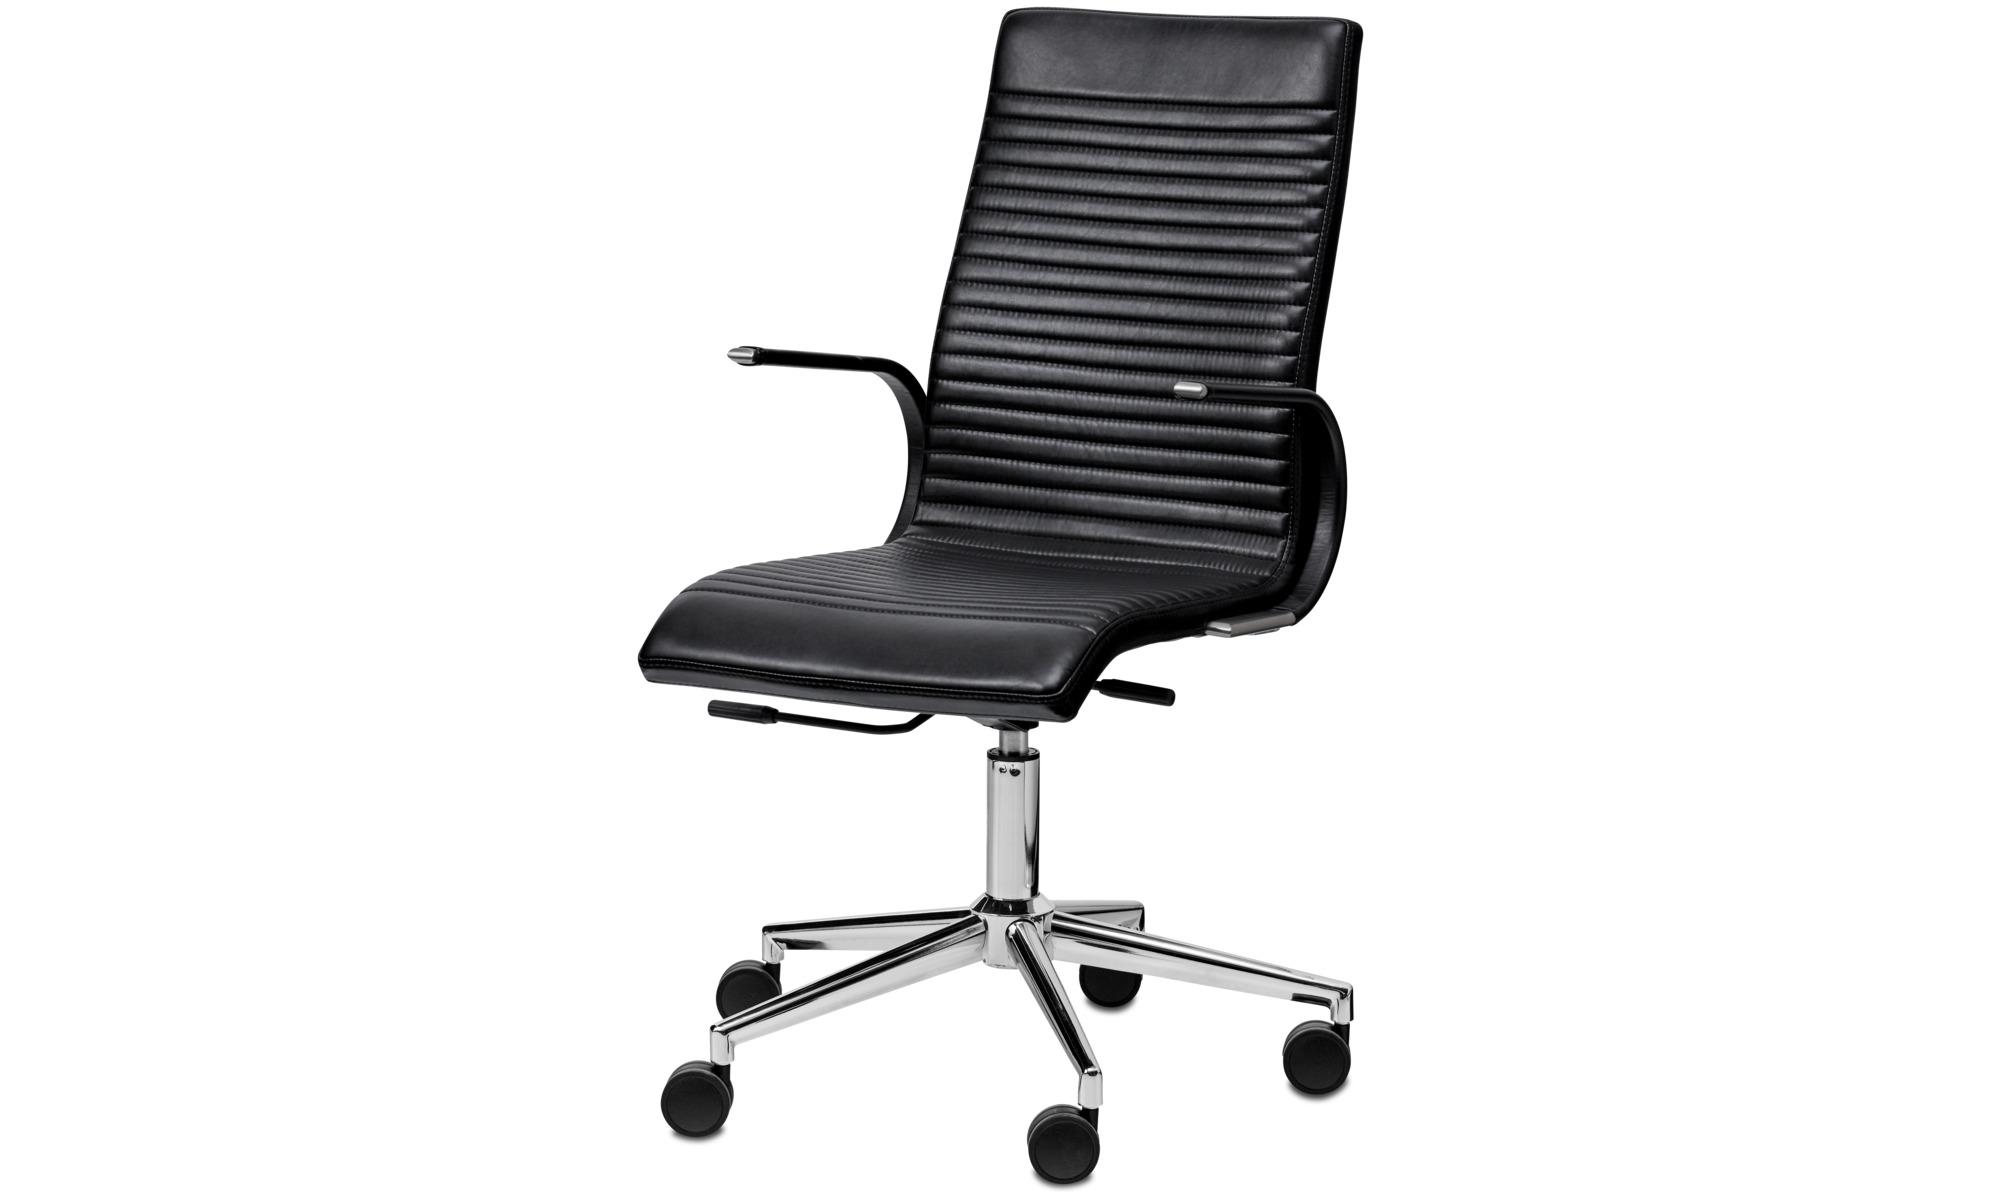 Bureau Boconcept De Chaises Chaise Ferrara CxoeWQrBd